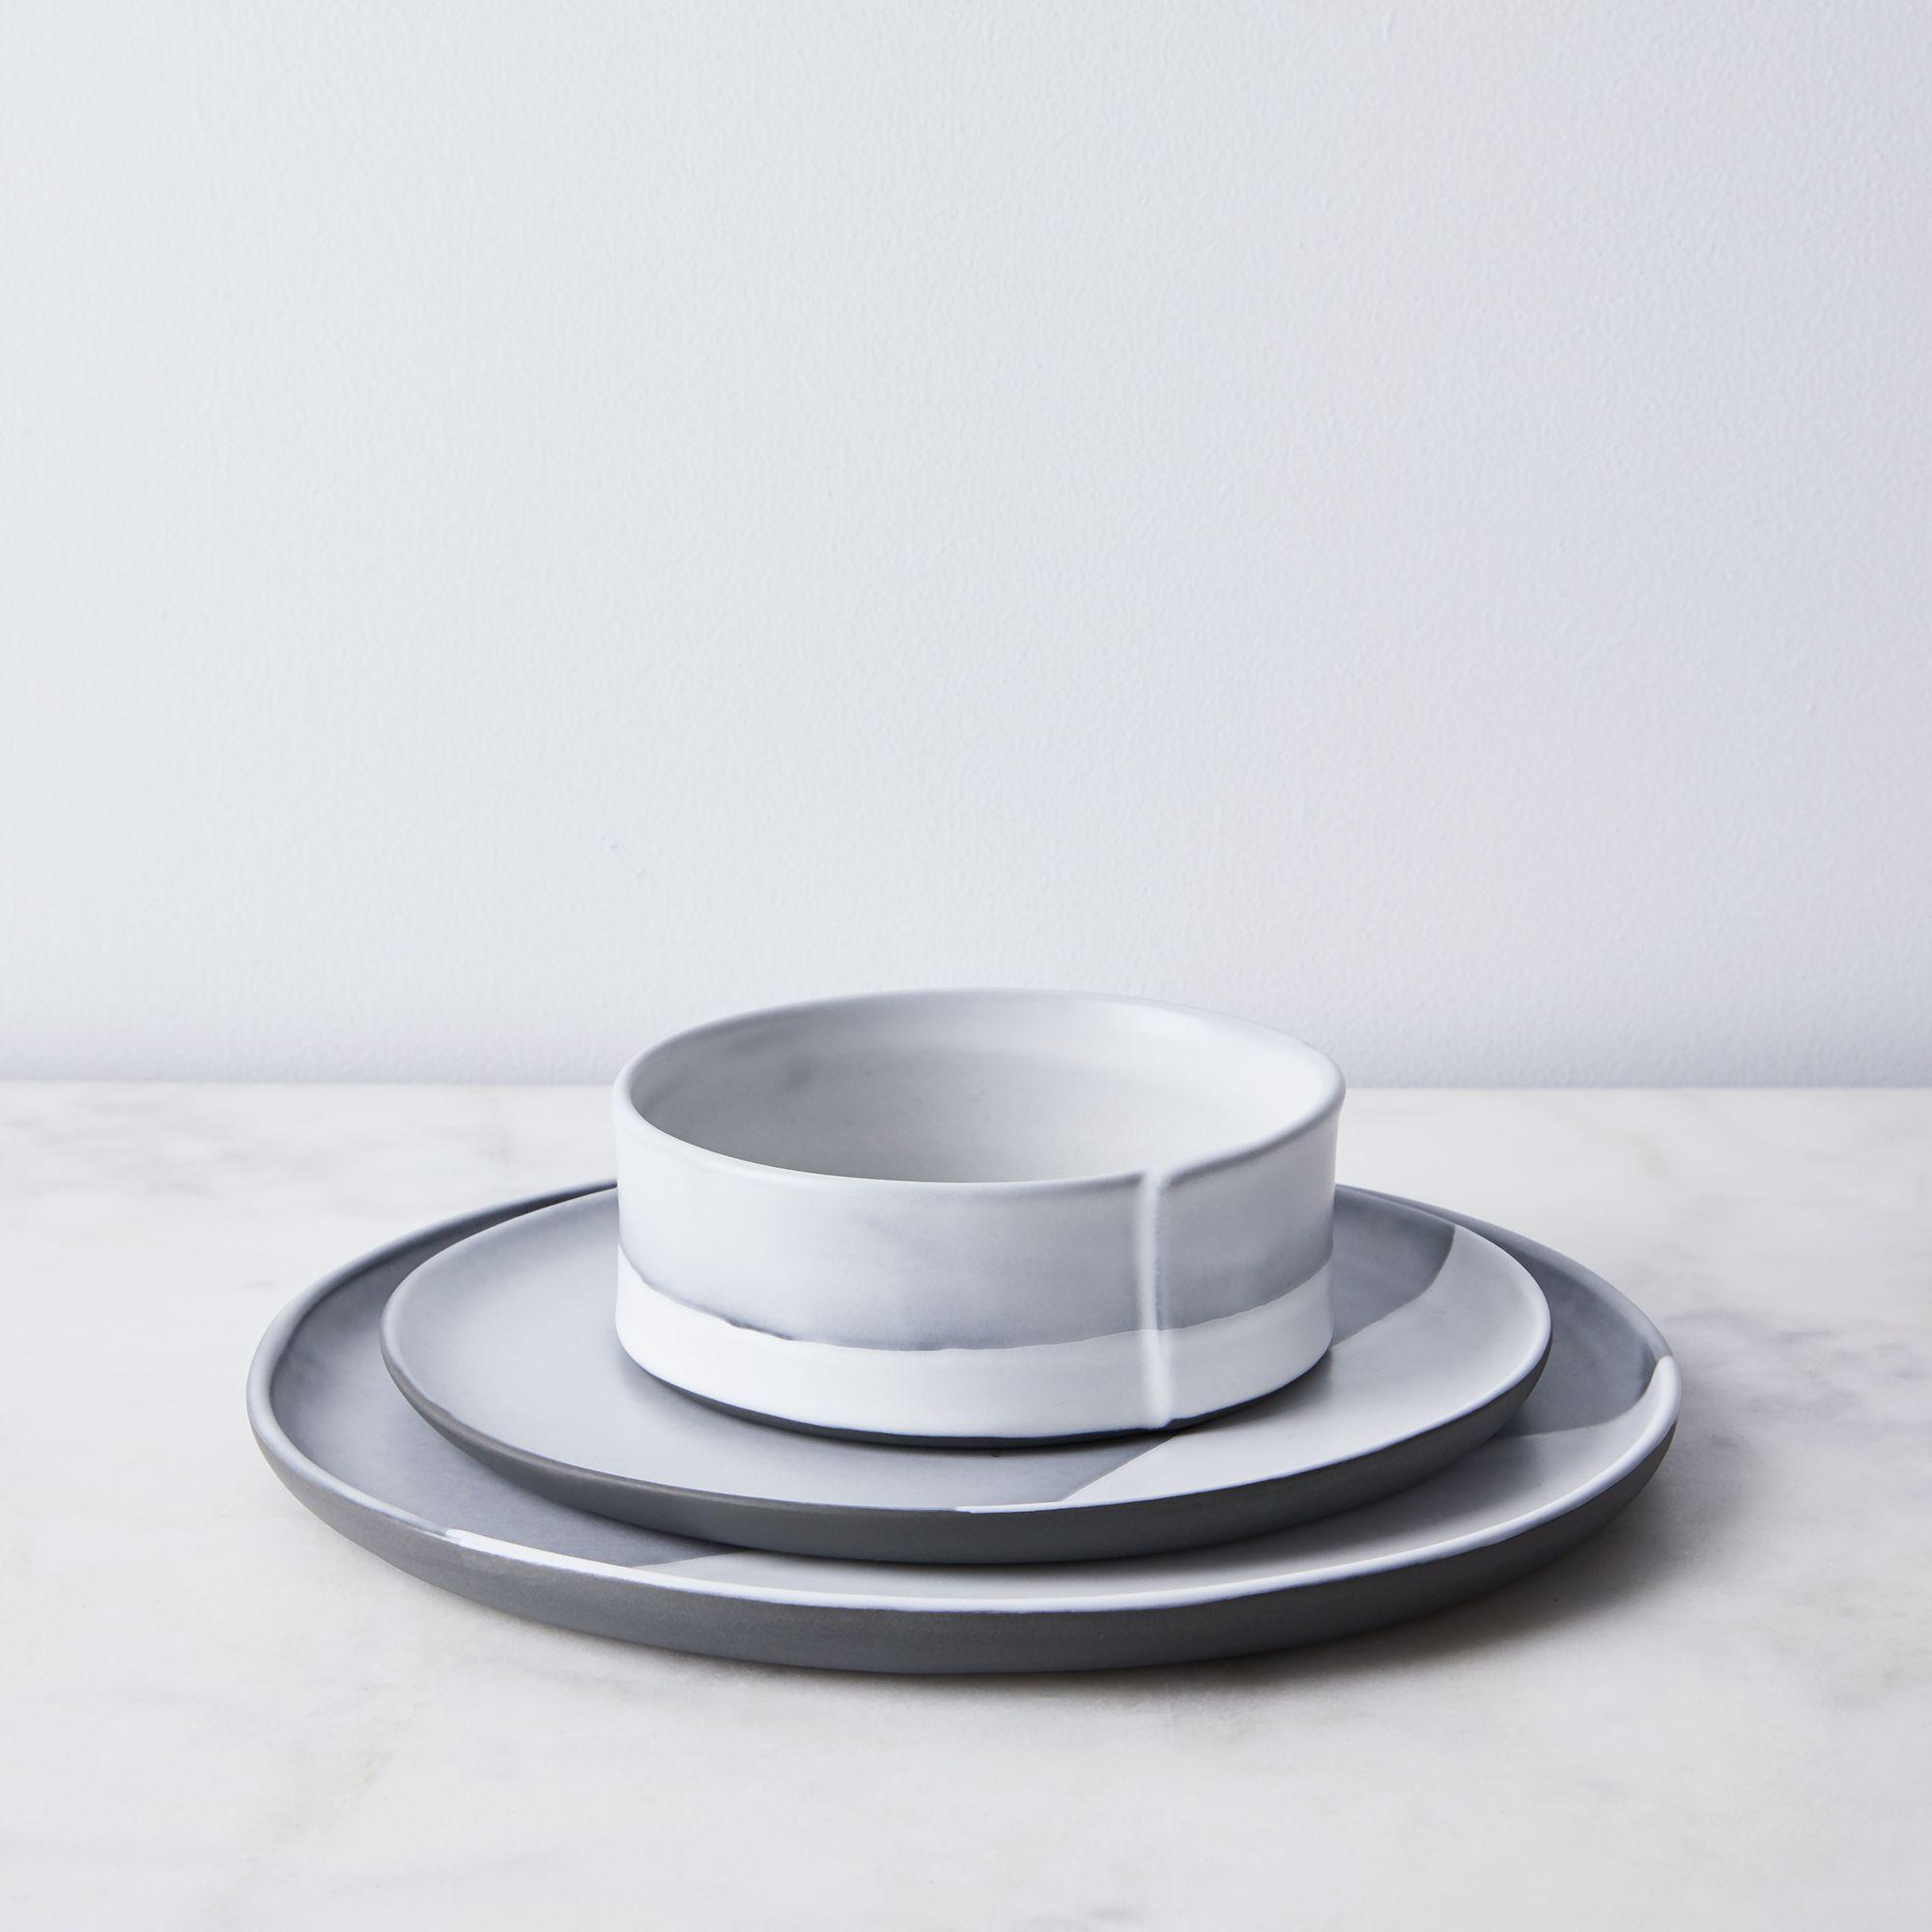 Plates by jgagen1